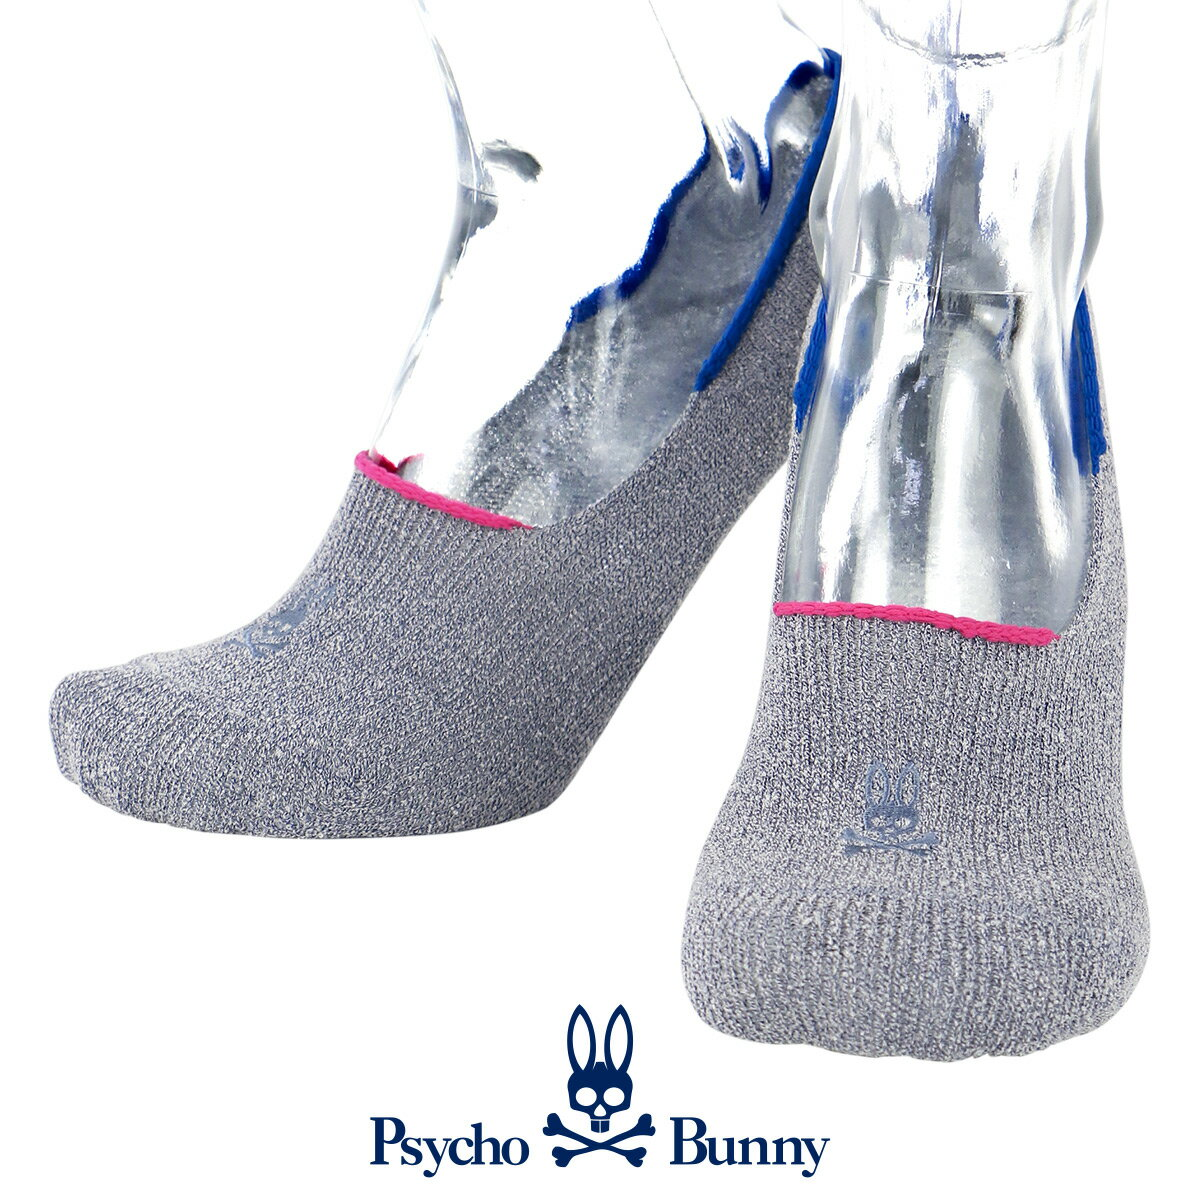 Psycho Bunny|サイコバニーメンズ ソックス 靴下フロントロゴ カラフル配色 フットカバー カバーソックス男性 メンズ プレゼント 贈答 ギフト2442-740スリッポン デッキシューズポイント10倍